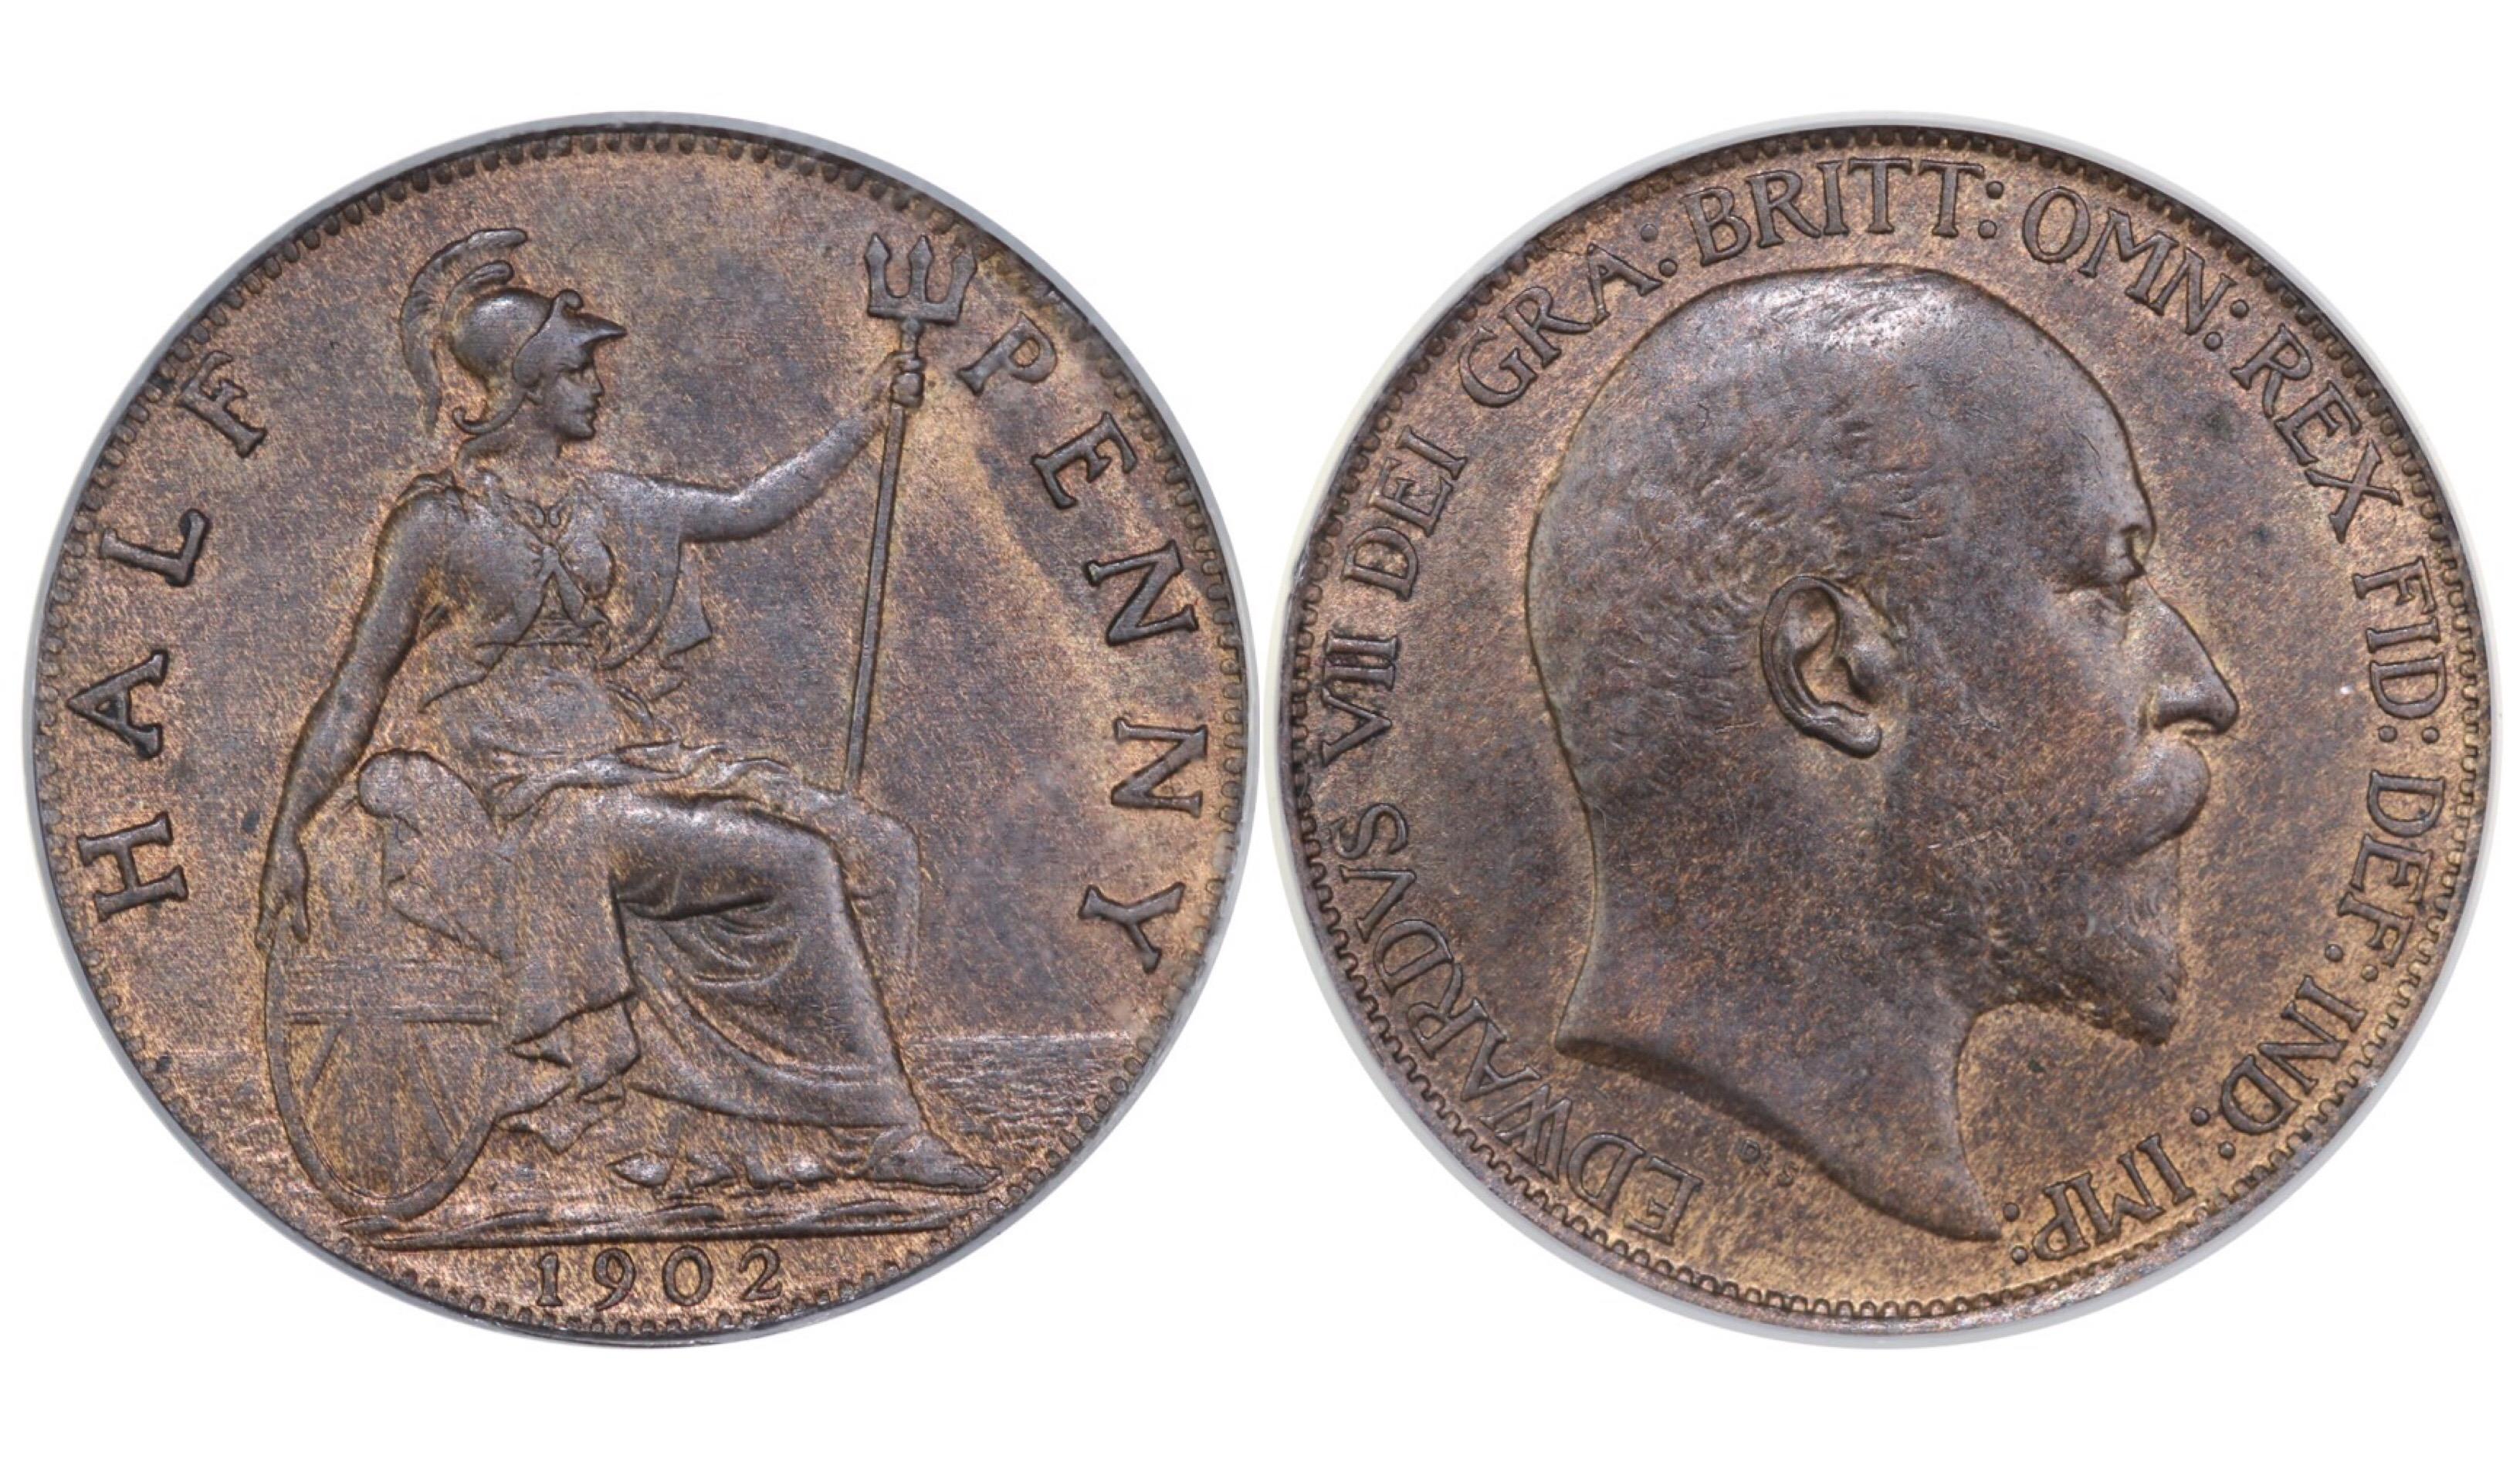 1902 Halfpenny, CGS 60, Edward VII, Freeman 381, UIN 22148